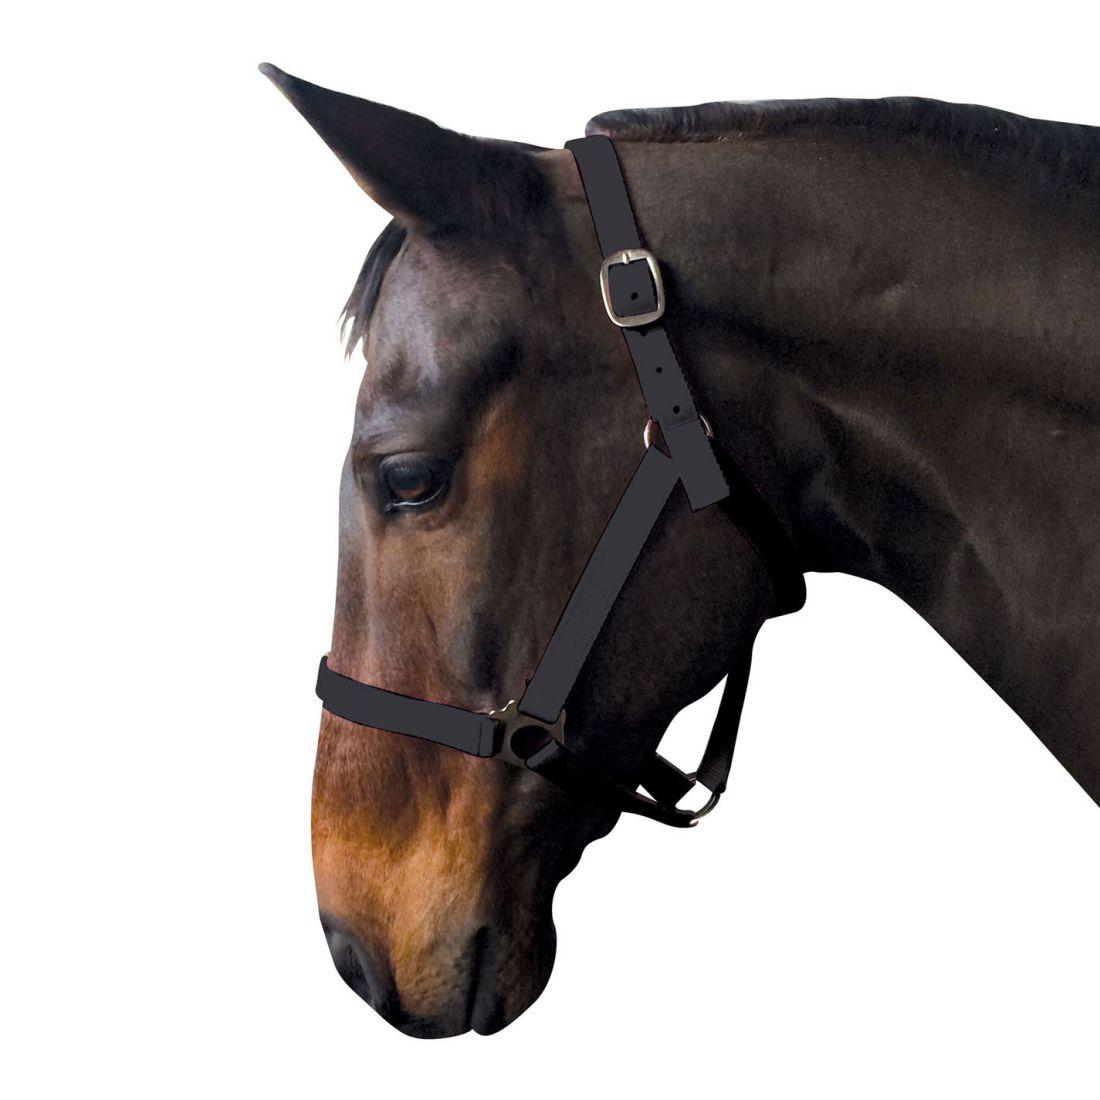 Requisite Econ Head Collar Horse Riding Accessories Headcollar